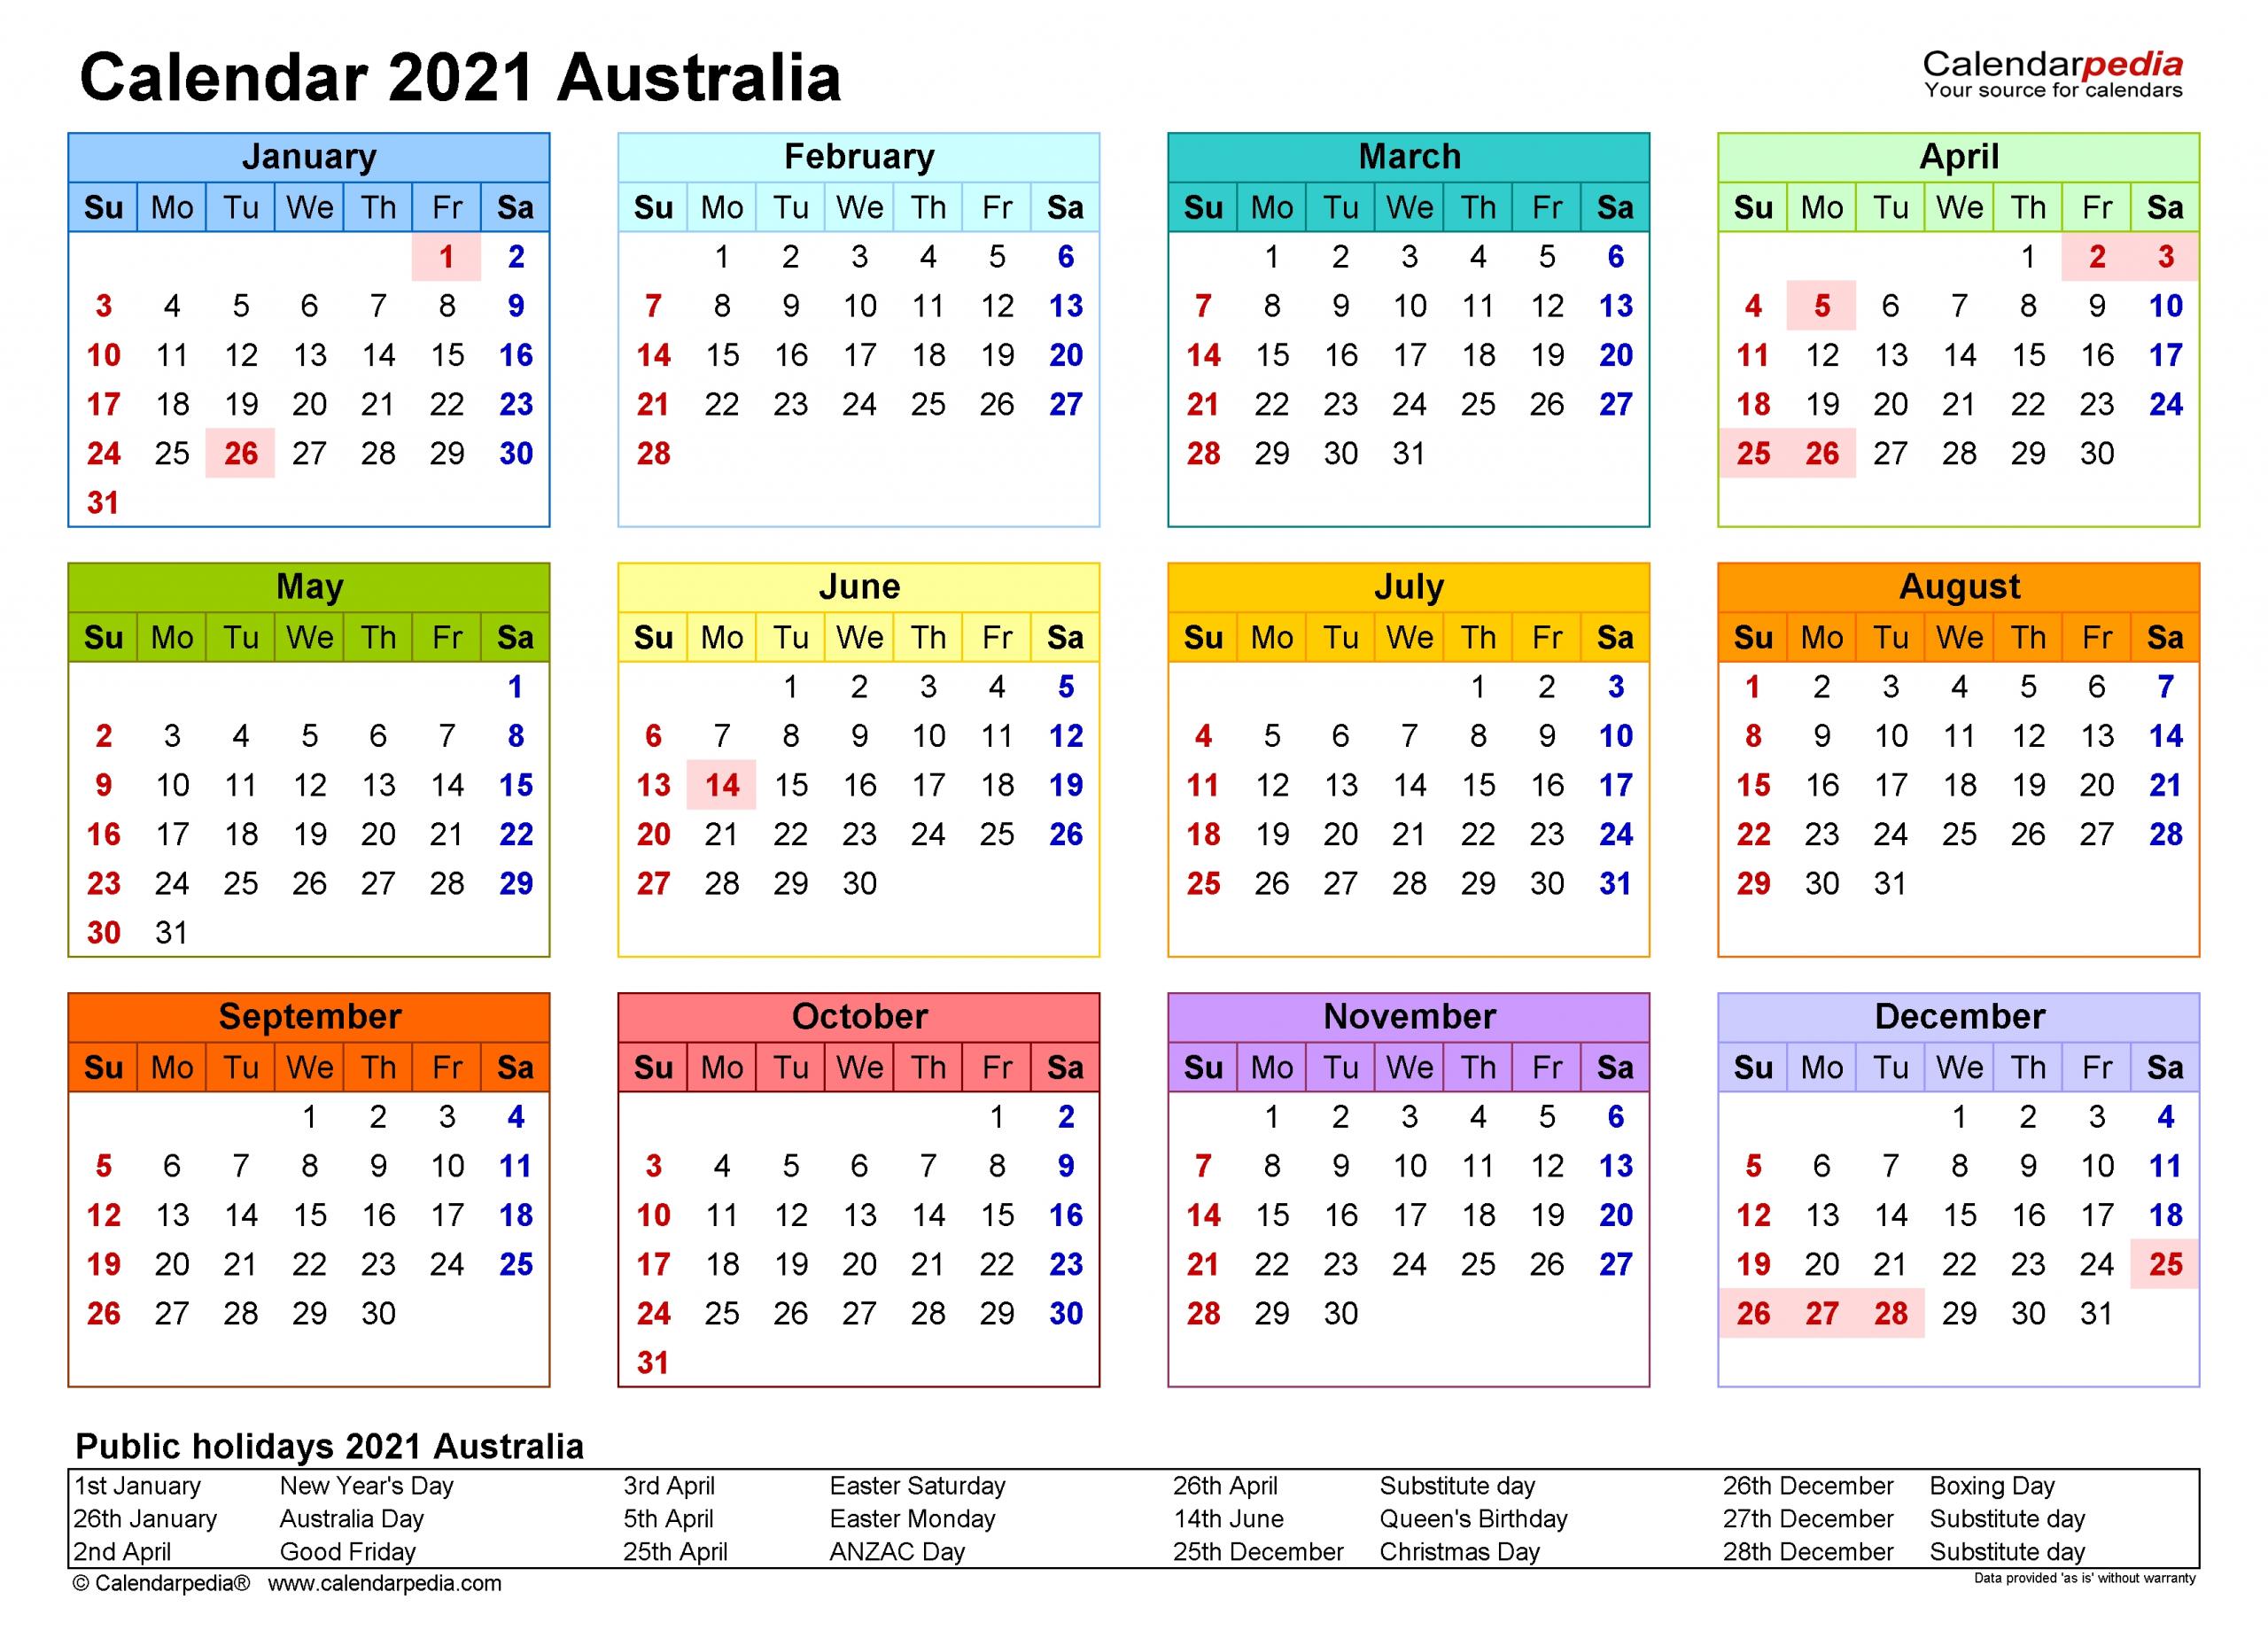 Free Printable Calendar 2021 Australia Yearly Calendar Template Printable Calendar Design Free Calendar Template